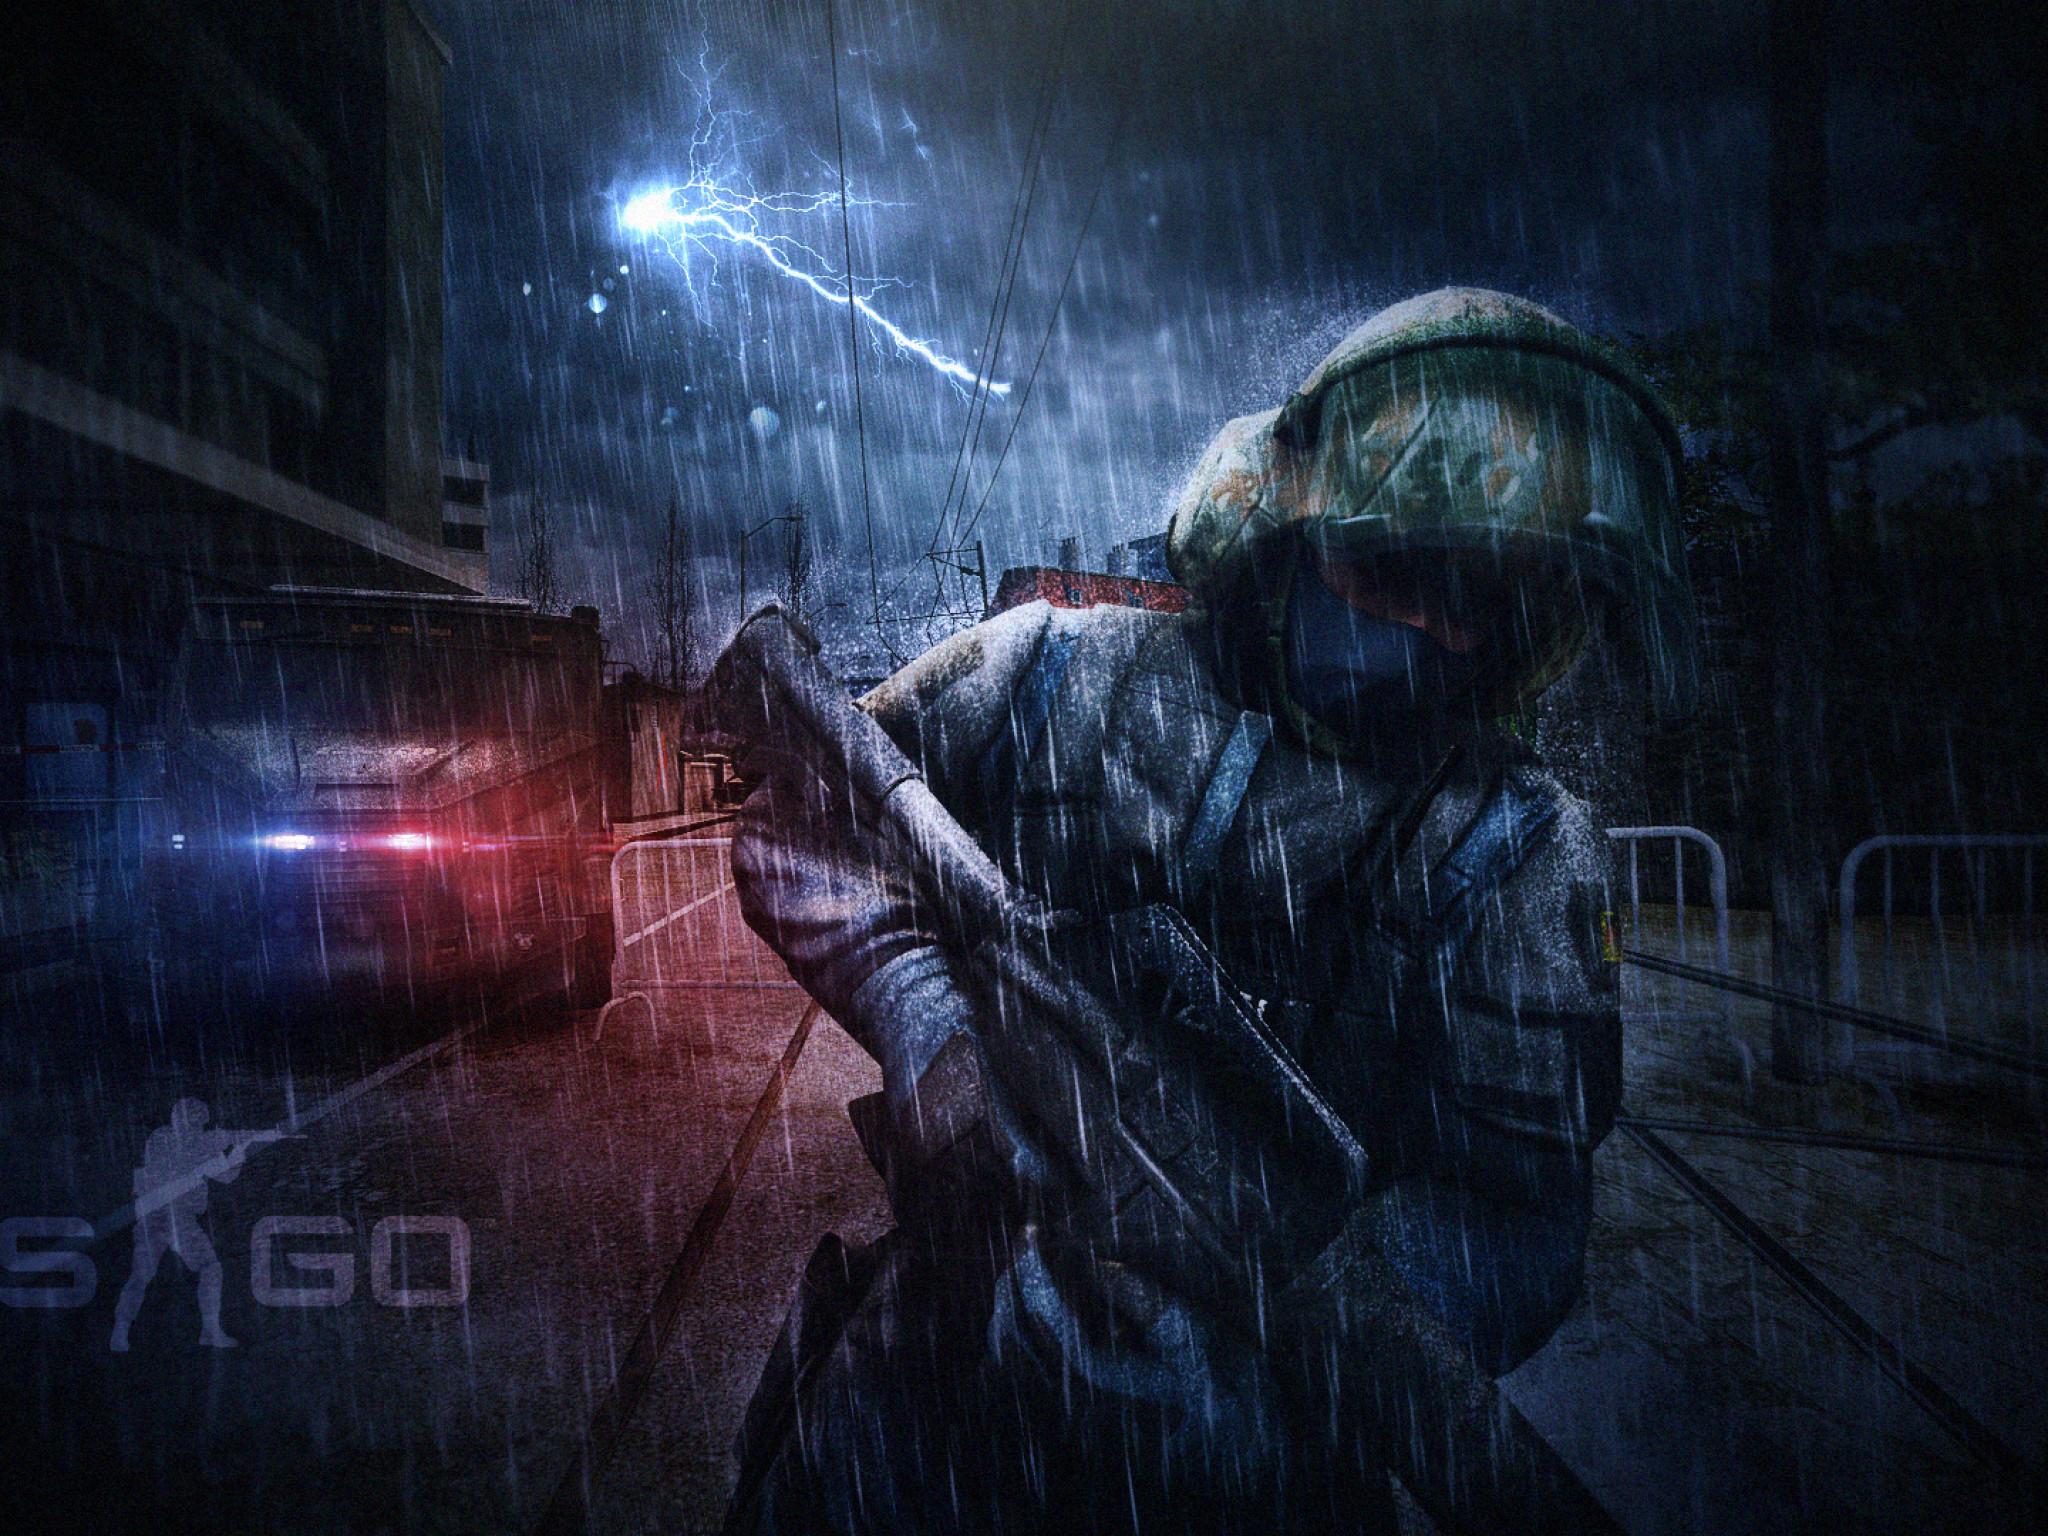 Counter Strike Global Offensive, Cs:go, Lightning, Soldier